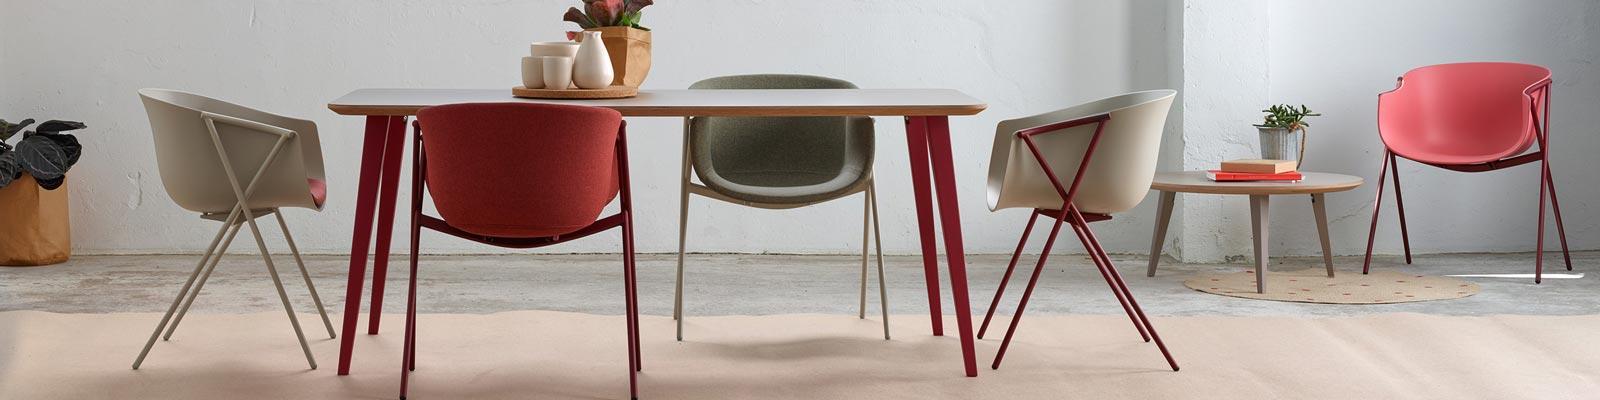 Furniture for the Algarve